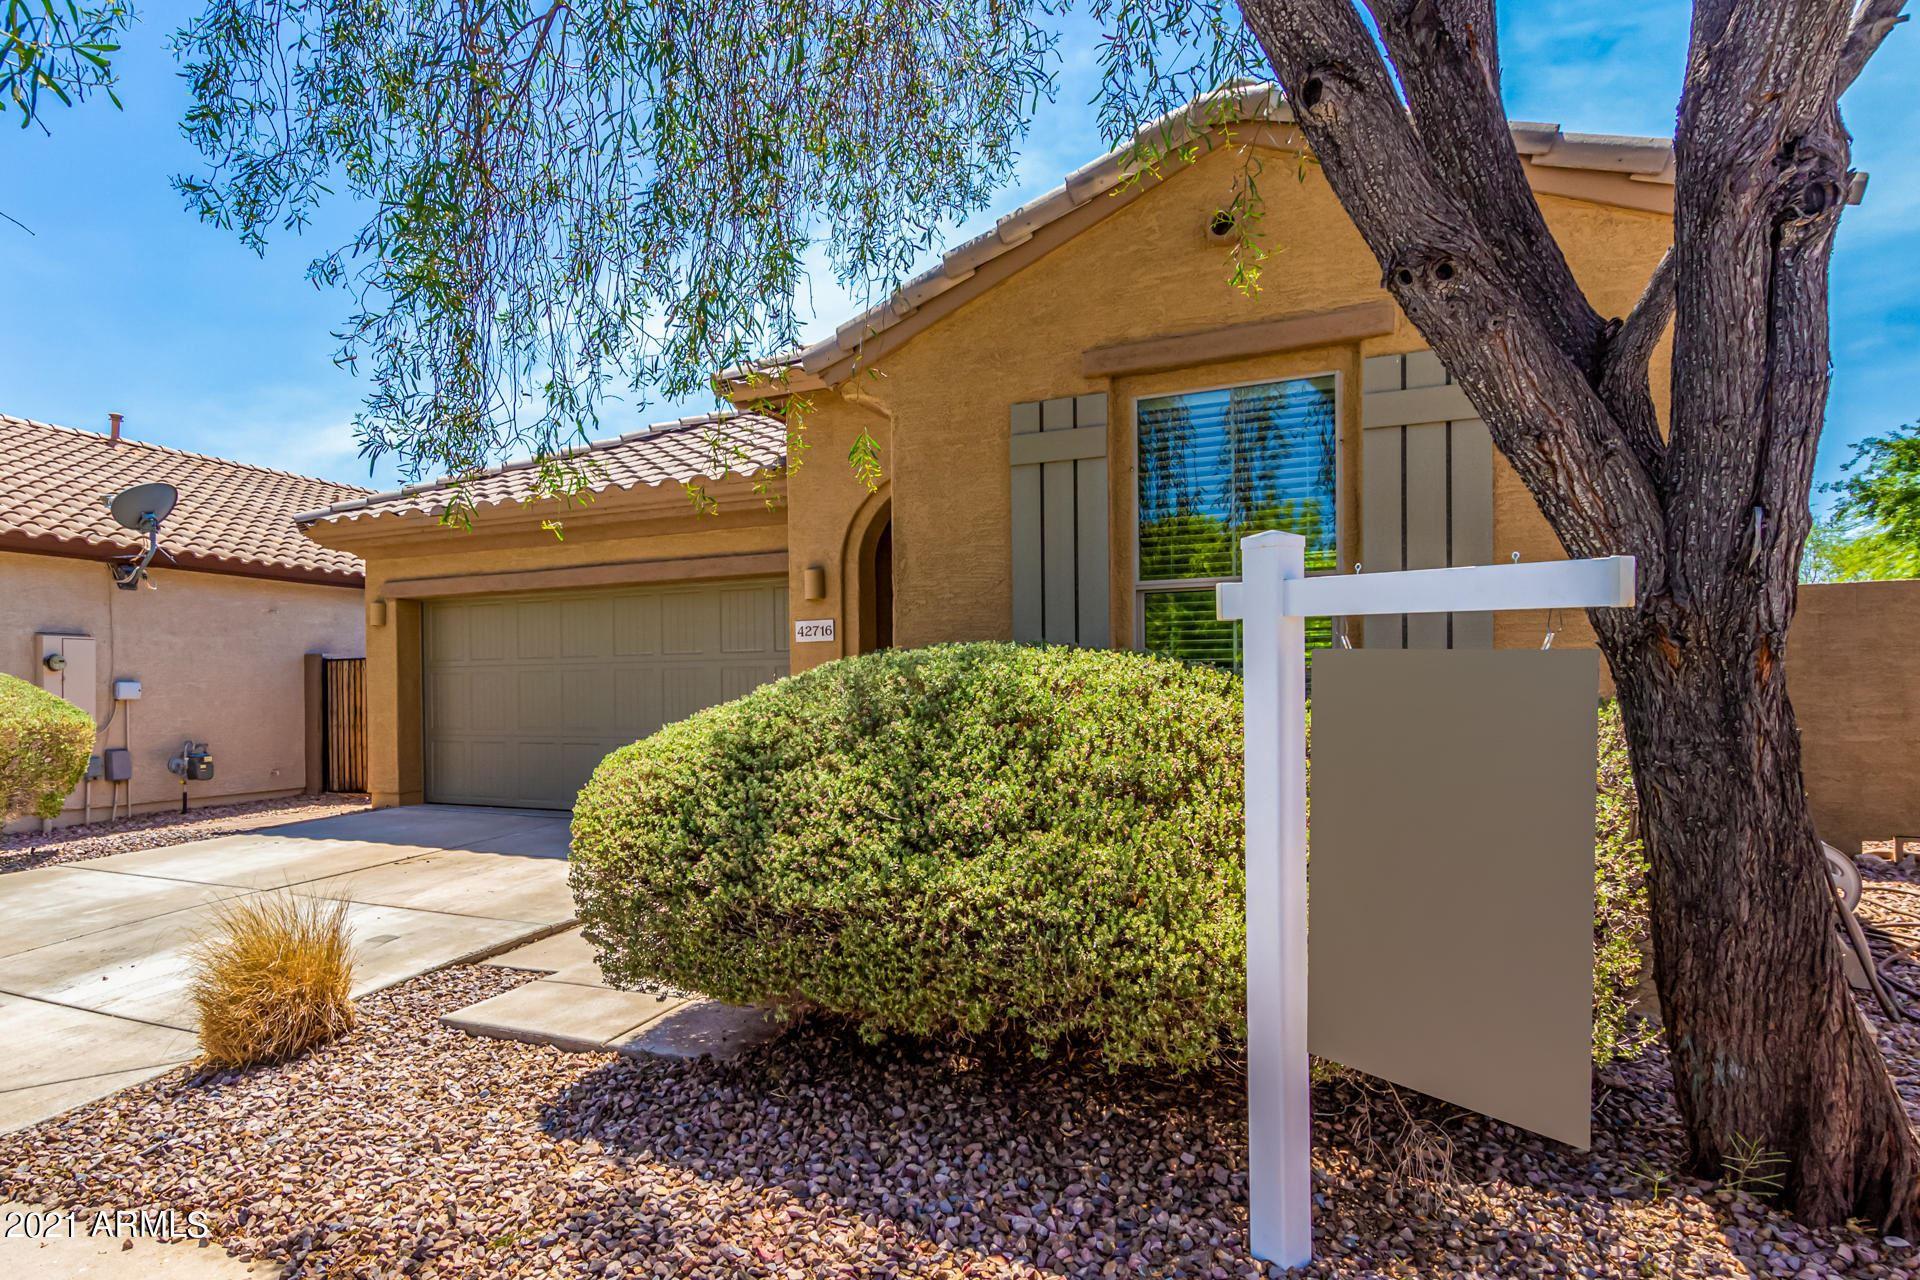 Photo of 42716 N 44TH Drive, New River, AZ 85087 (MLS # 6248460)